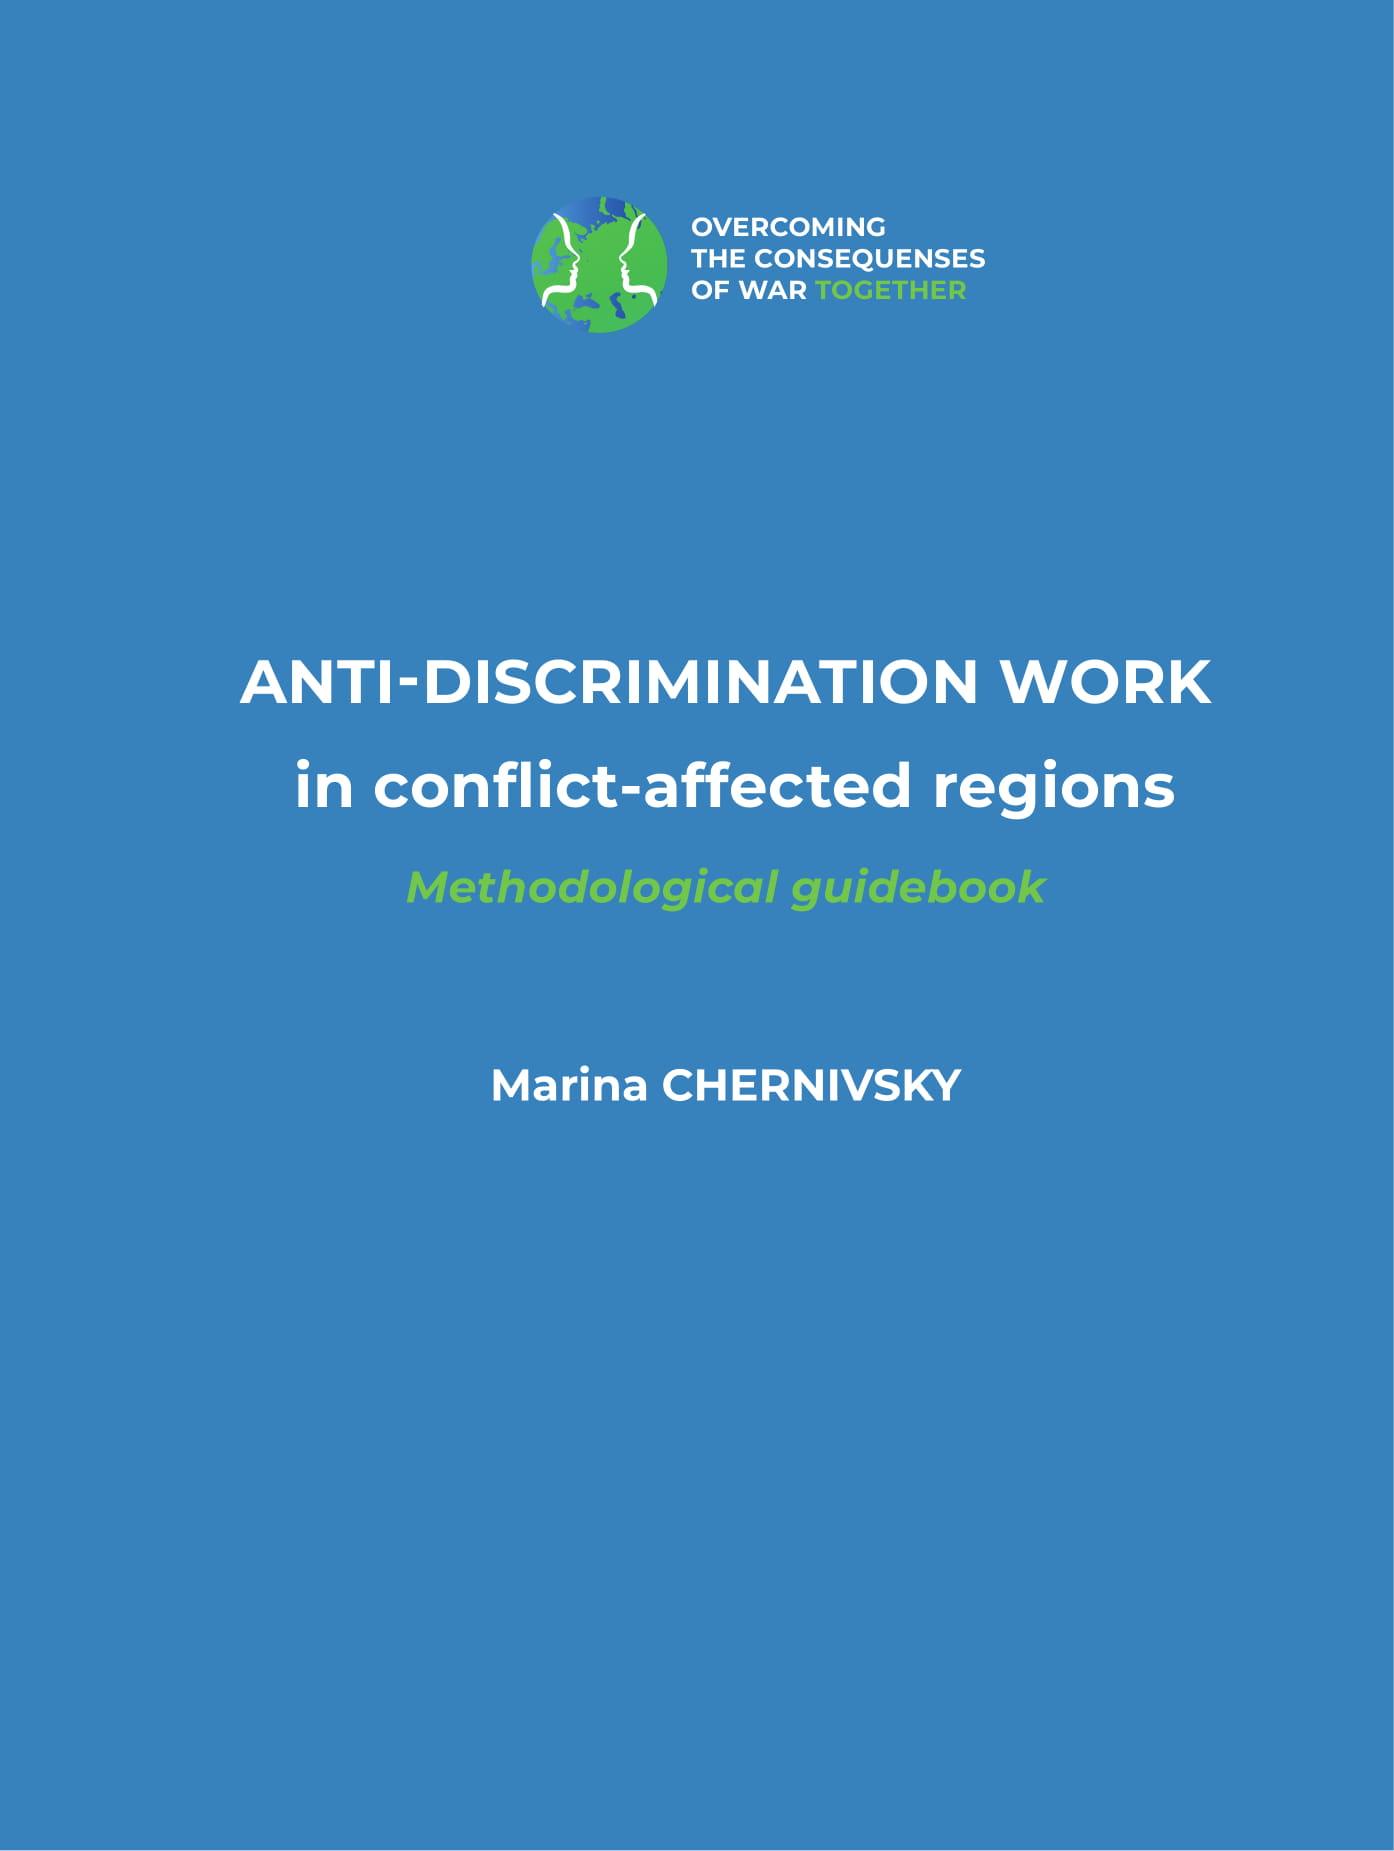 ENG Антидискриминация_превью-pages-1-1